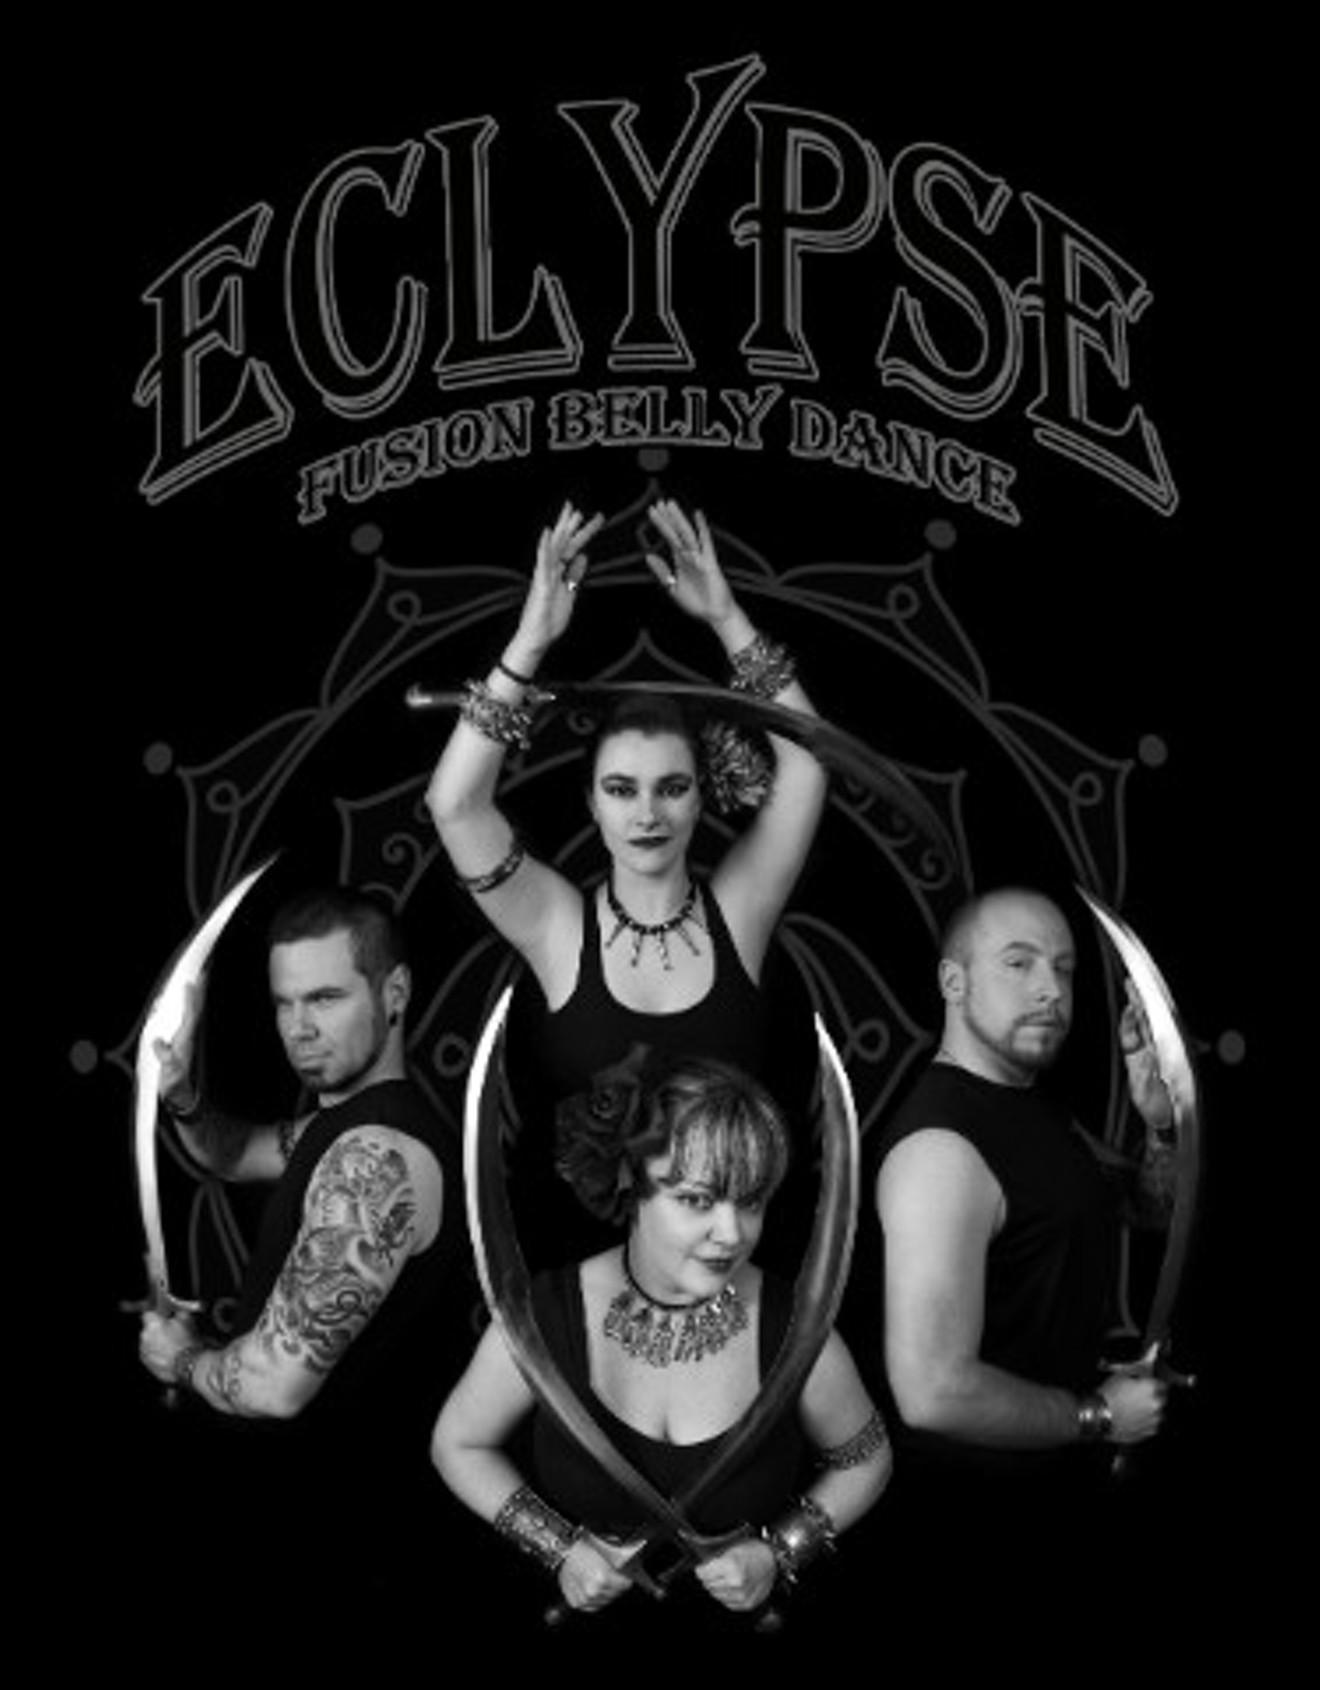 Cybelle - ECLYPSE World Fusion Bellydance